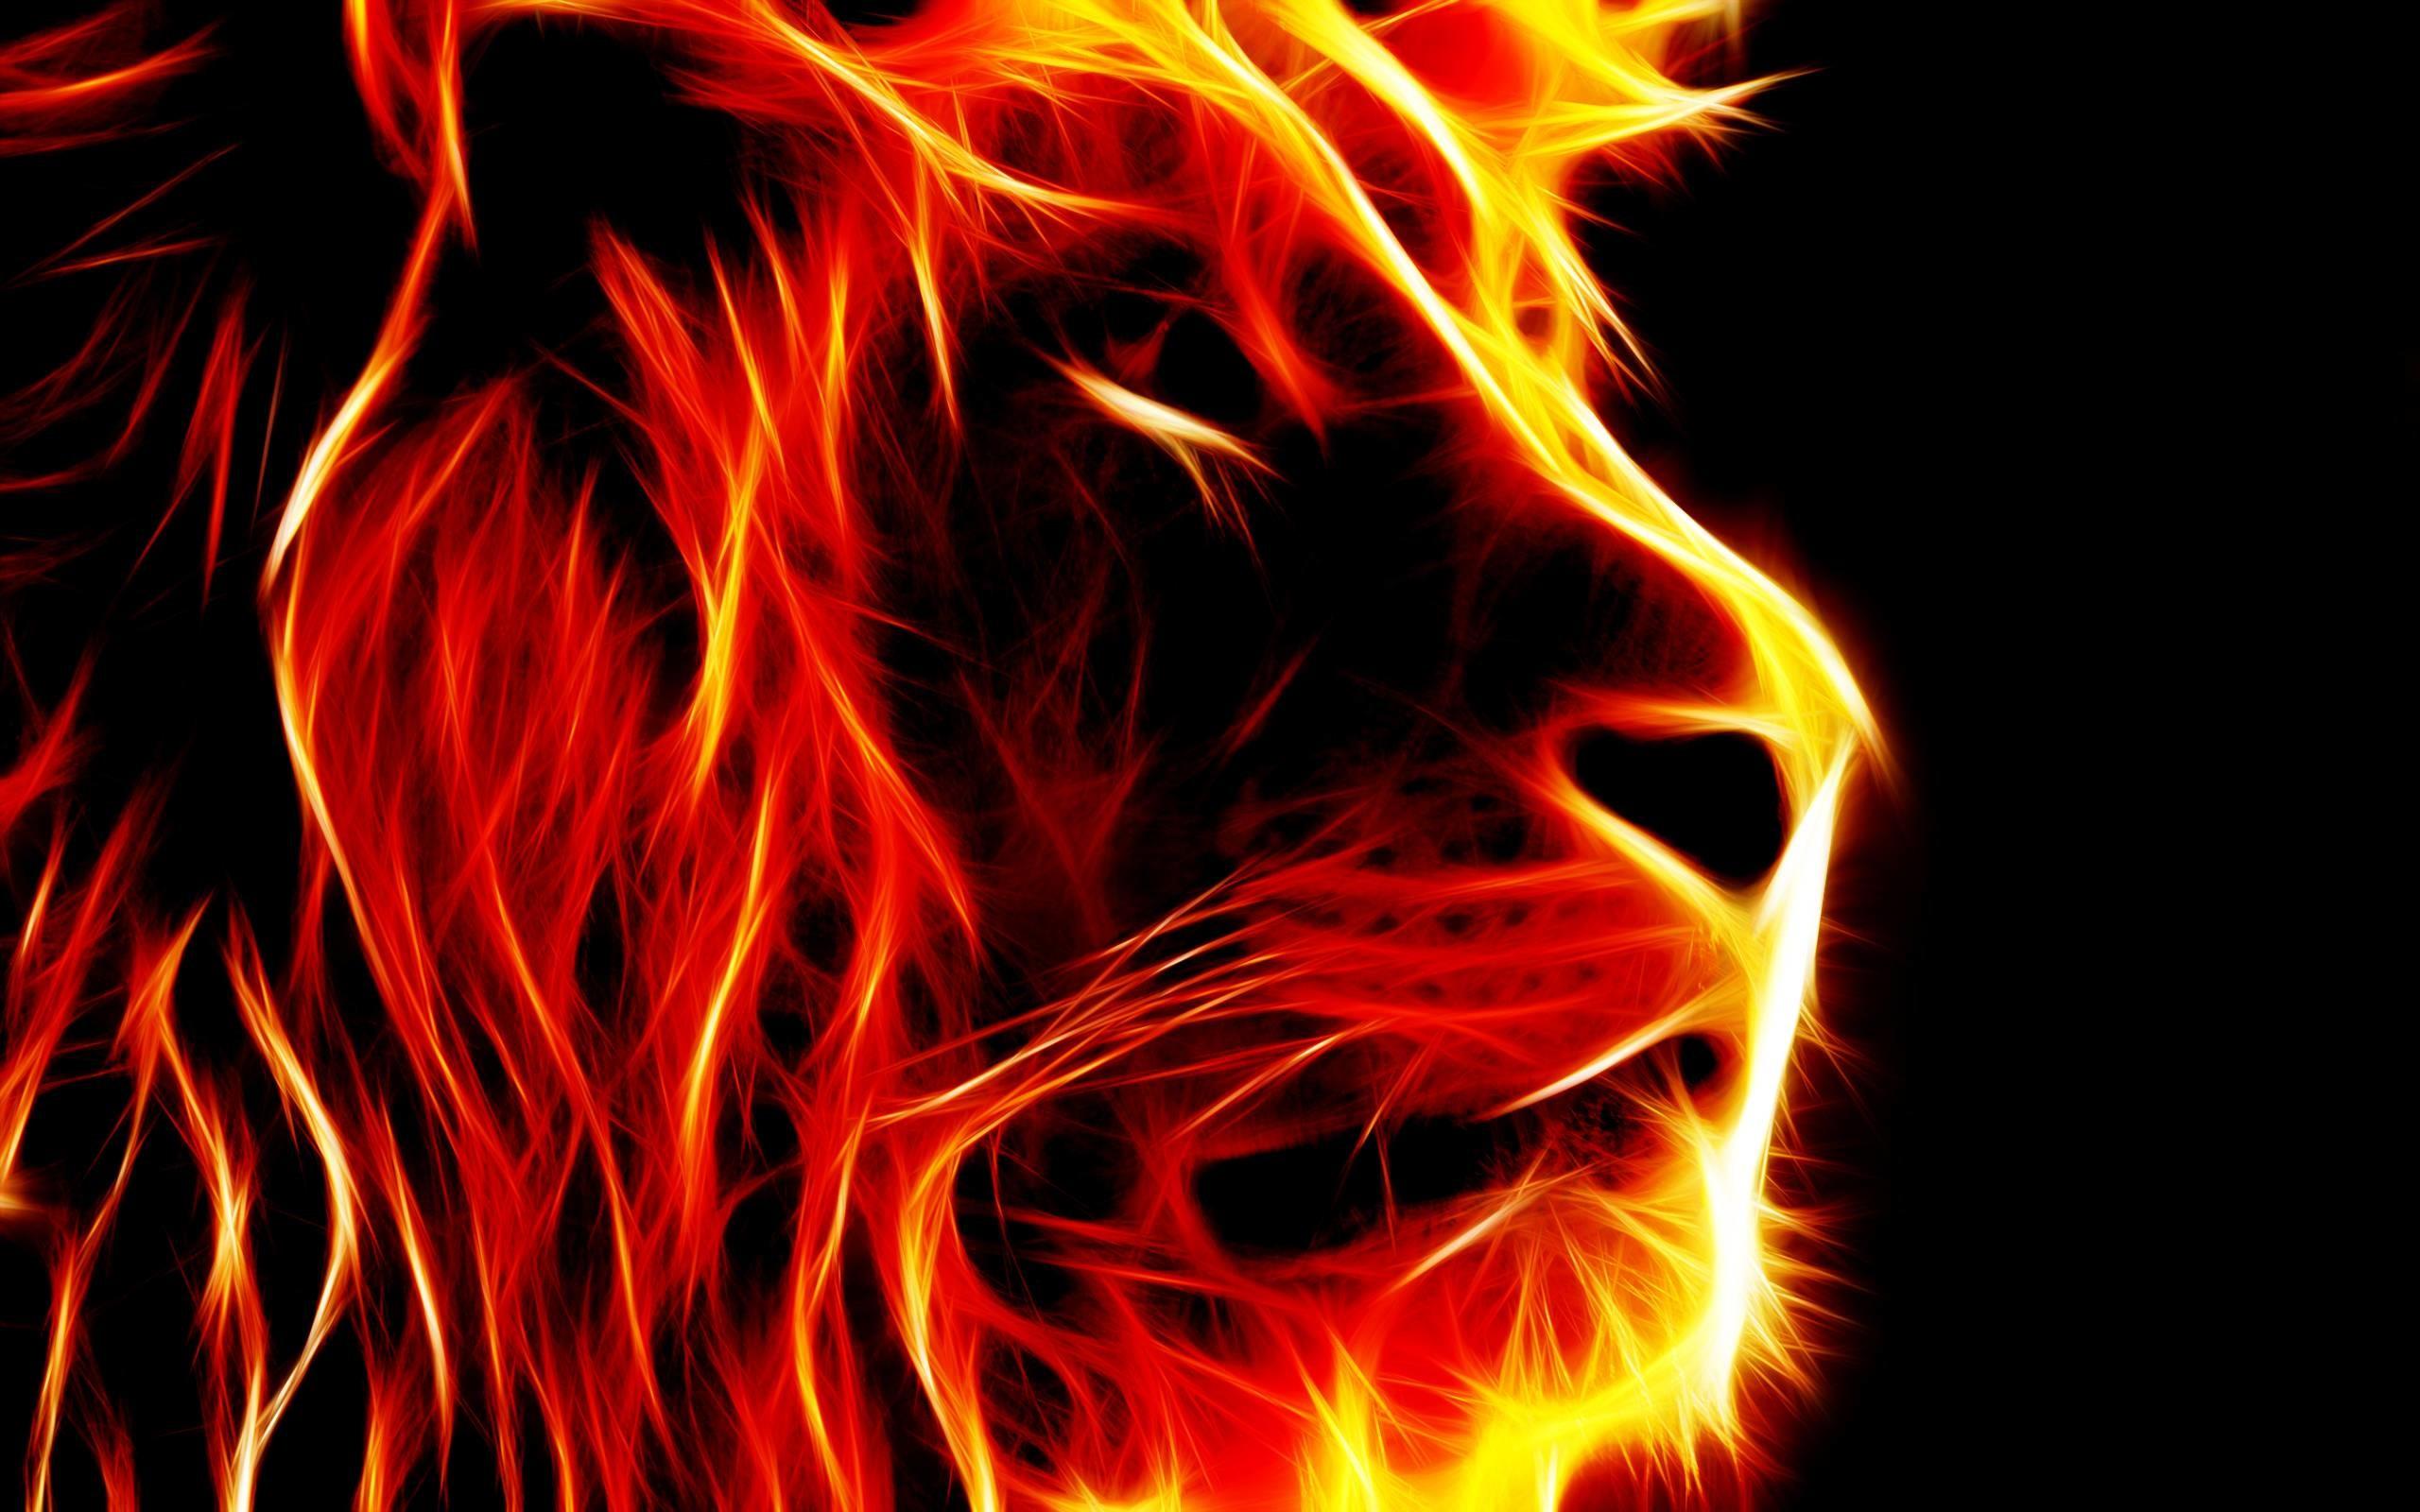 Noteworthy Artistic Fire Lion Wallpaper Hd 2560x1600PX ~ Artistic .